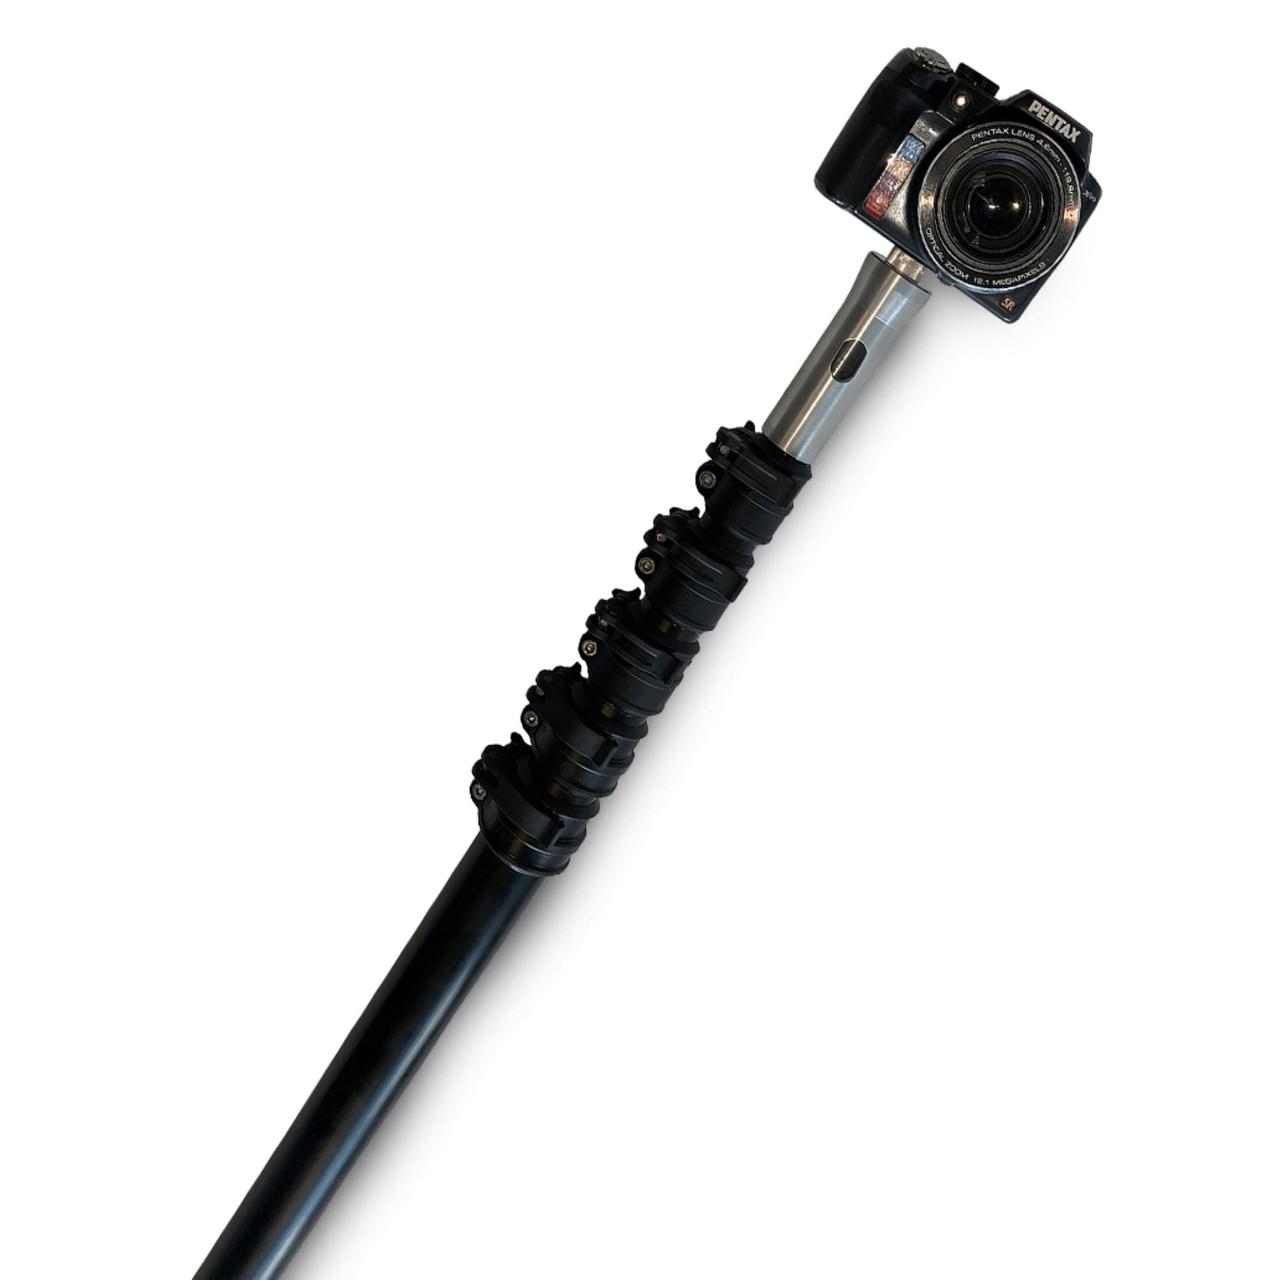 42ft Carbon Fibre Telescopic Monopod Camera Pole